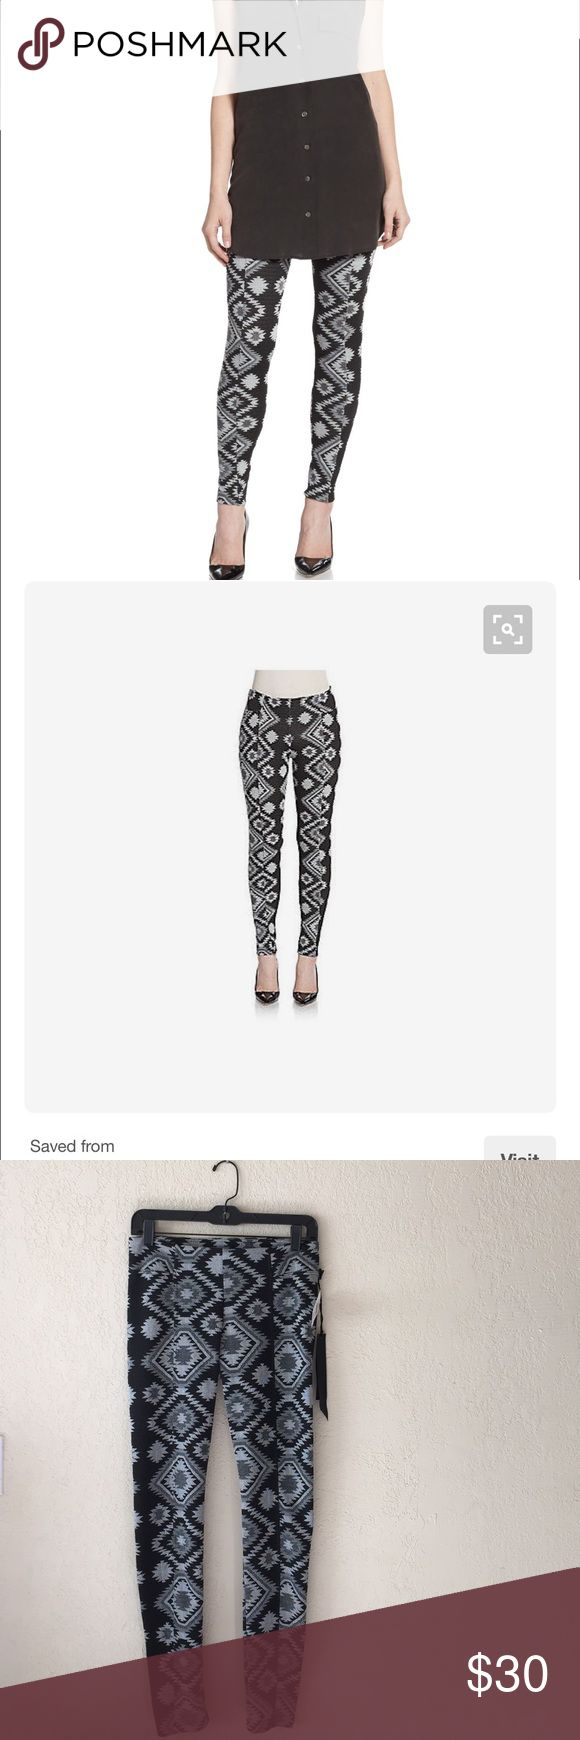 Leggings Jersy leggings with ganado inspired motif elastic waistline asymmetrical seams back button welt pocket inseam about 27 inch ..polyester spandex .brand new👗 silva ganado Pants Leggings